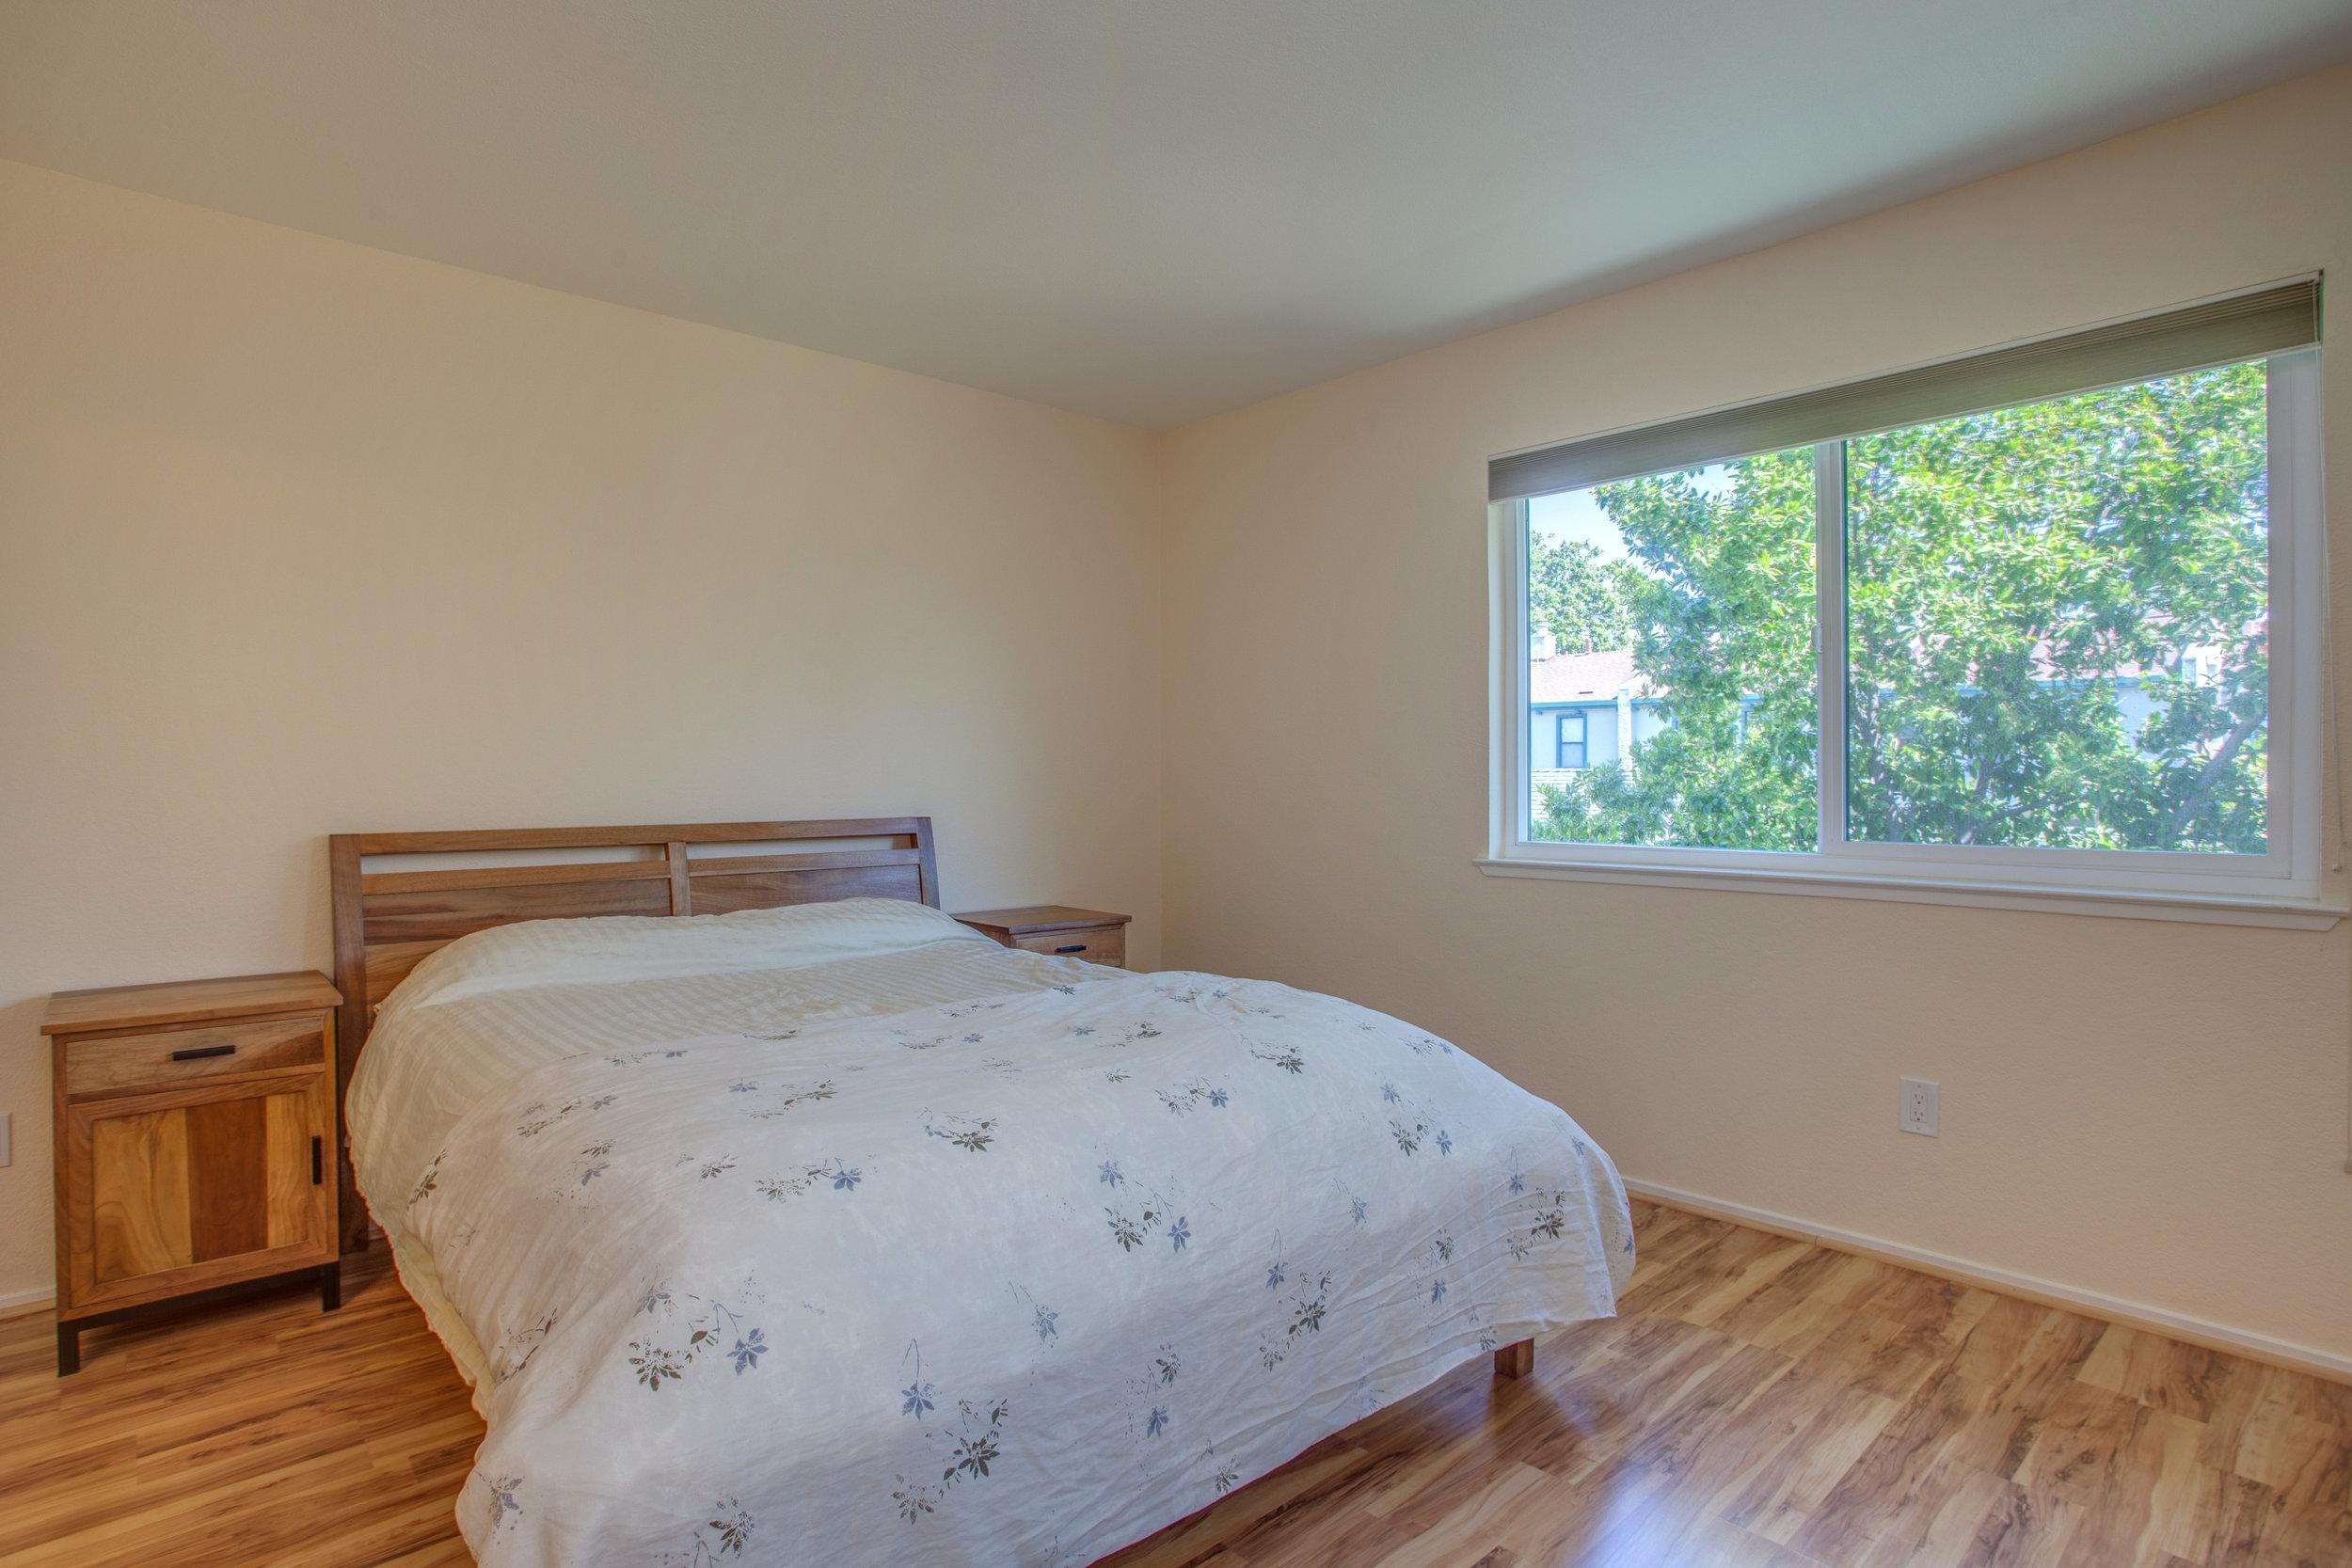 2040_main_street_105_MLS_HID1147580_ROOMbedroom.jpg